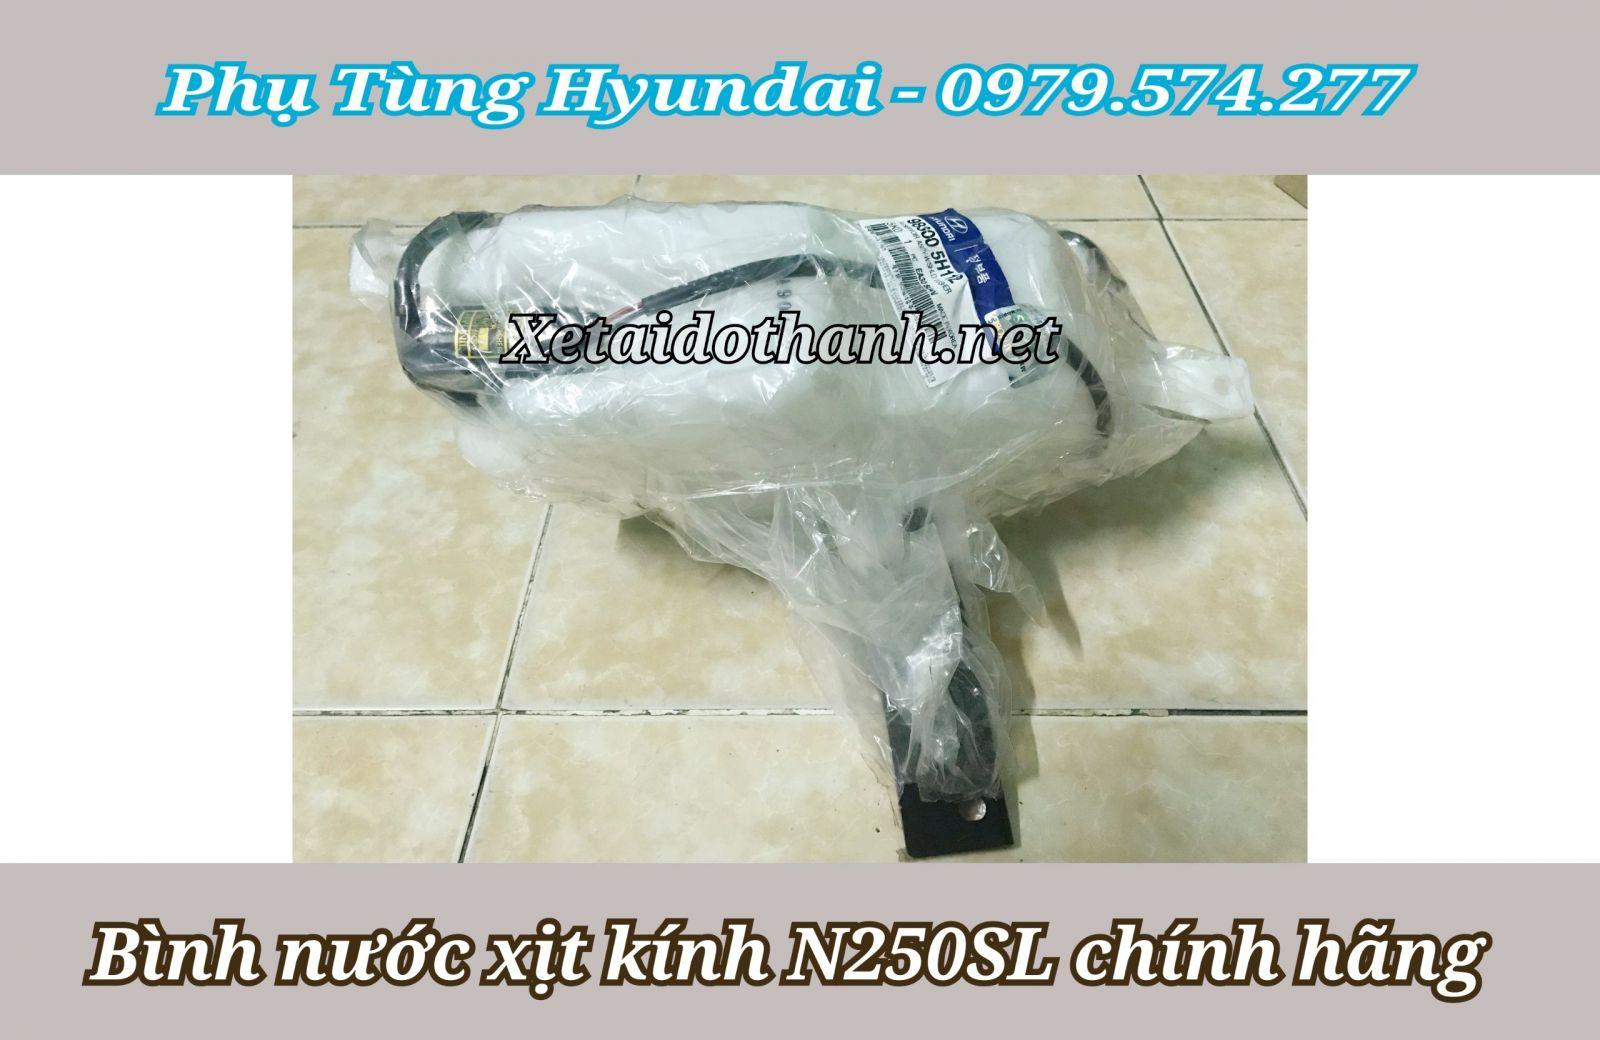 BINH NUOC RUA KINH N250 CHINH HANG